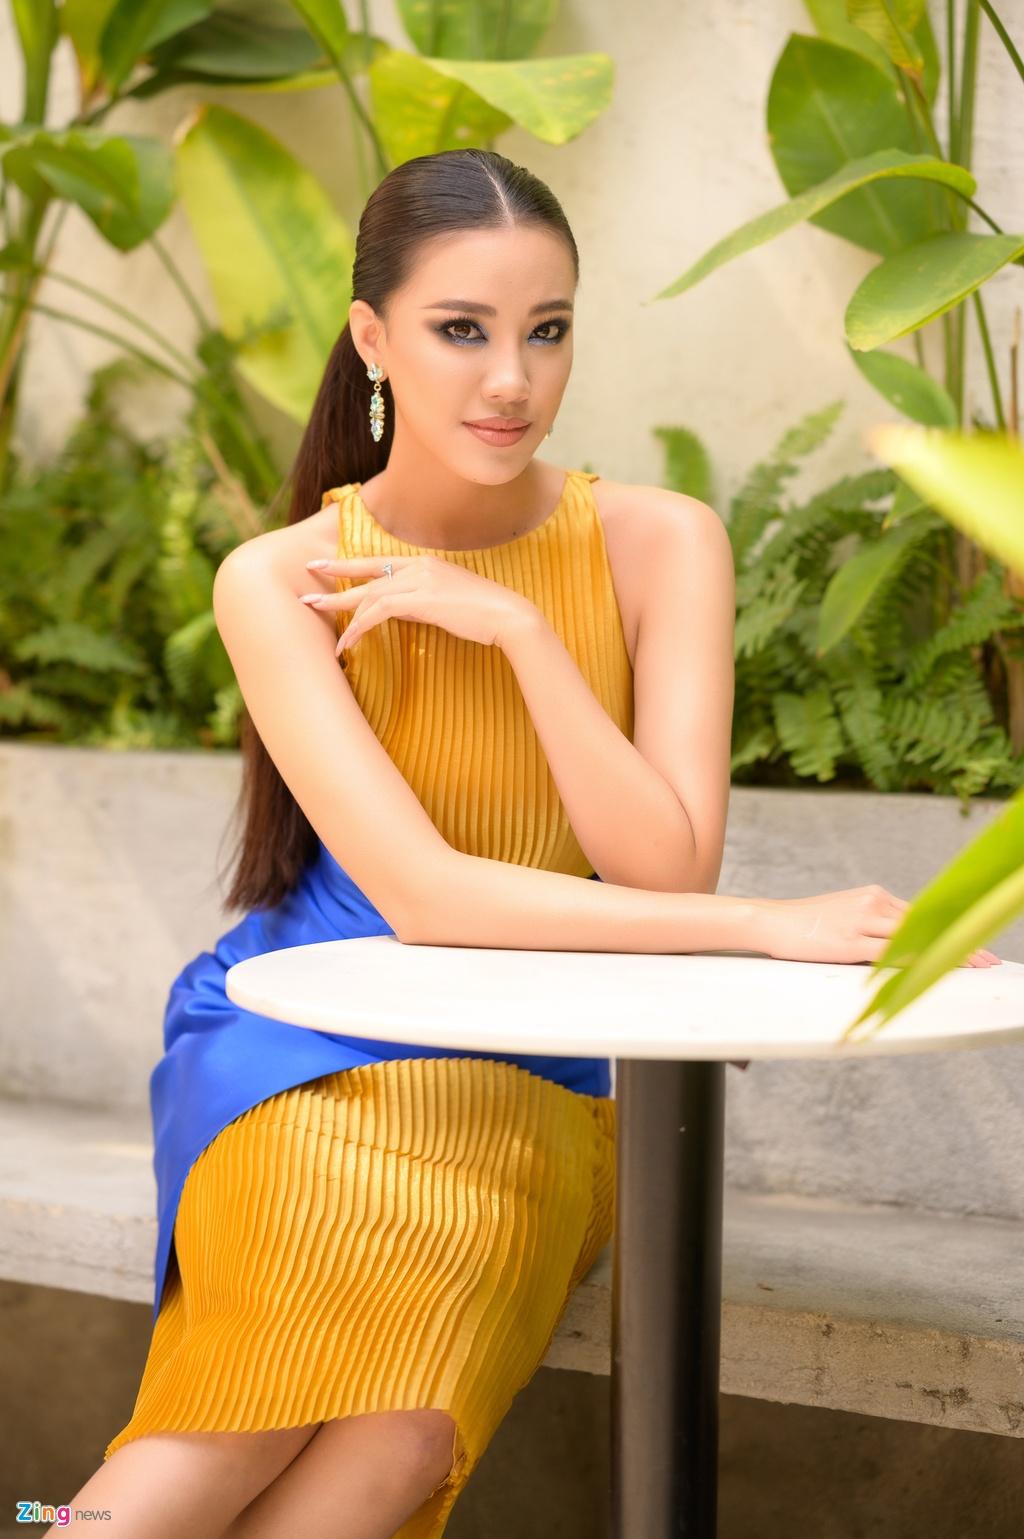 A hau Kim Duyen: 'Ba me toi van day tu 3h sang ban com binh dan' hinh anh 8 kimduyen5_zing.jpg